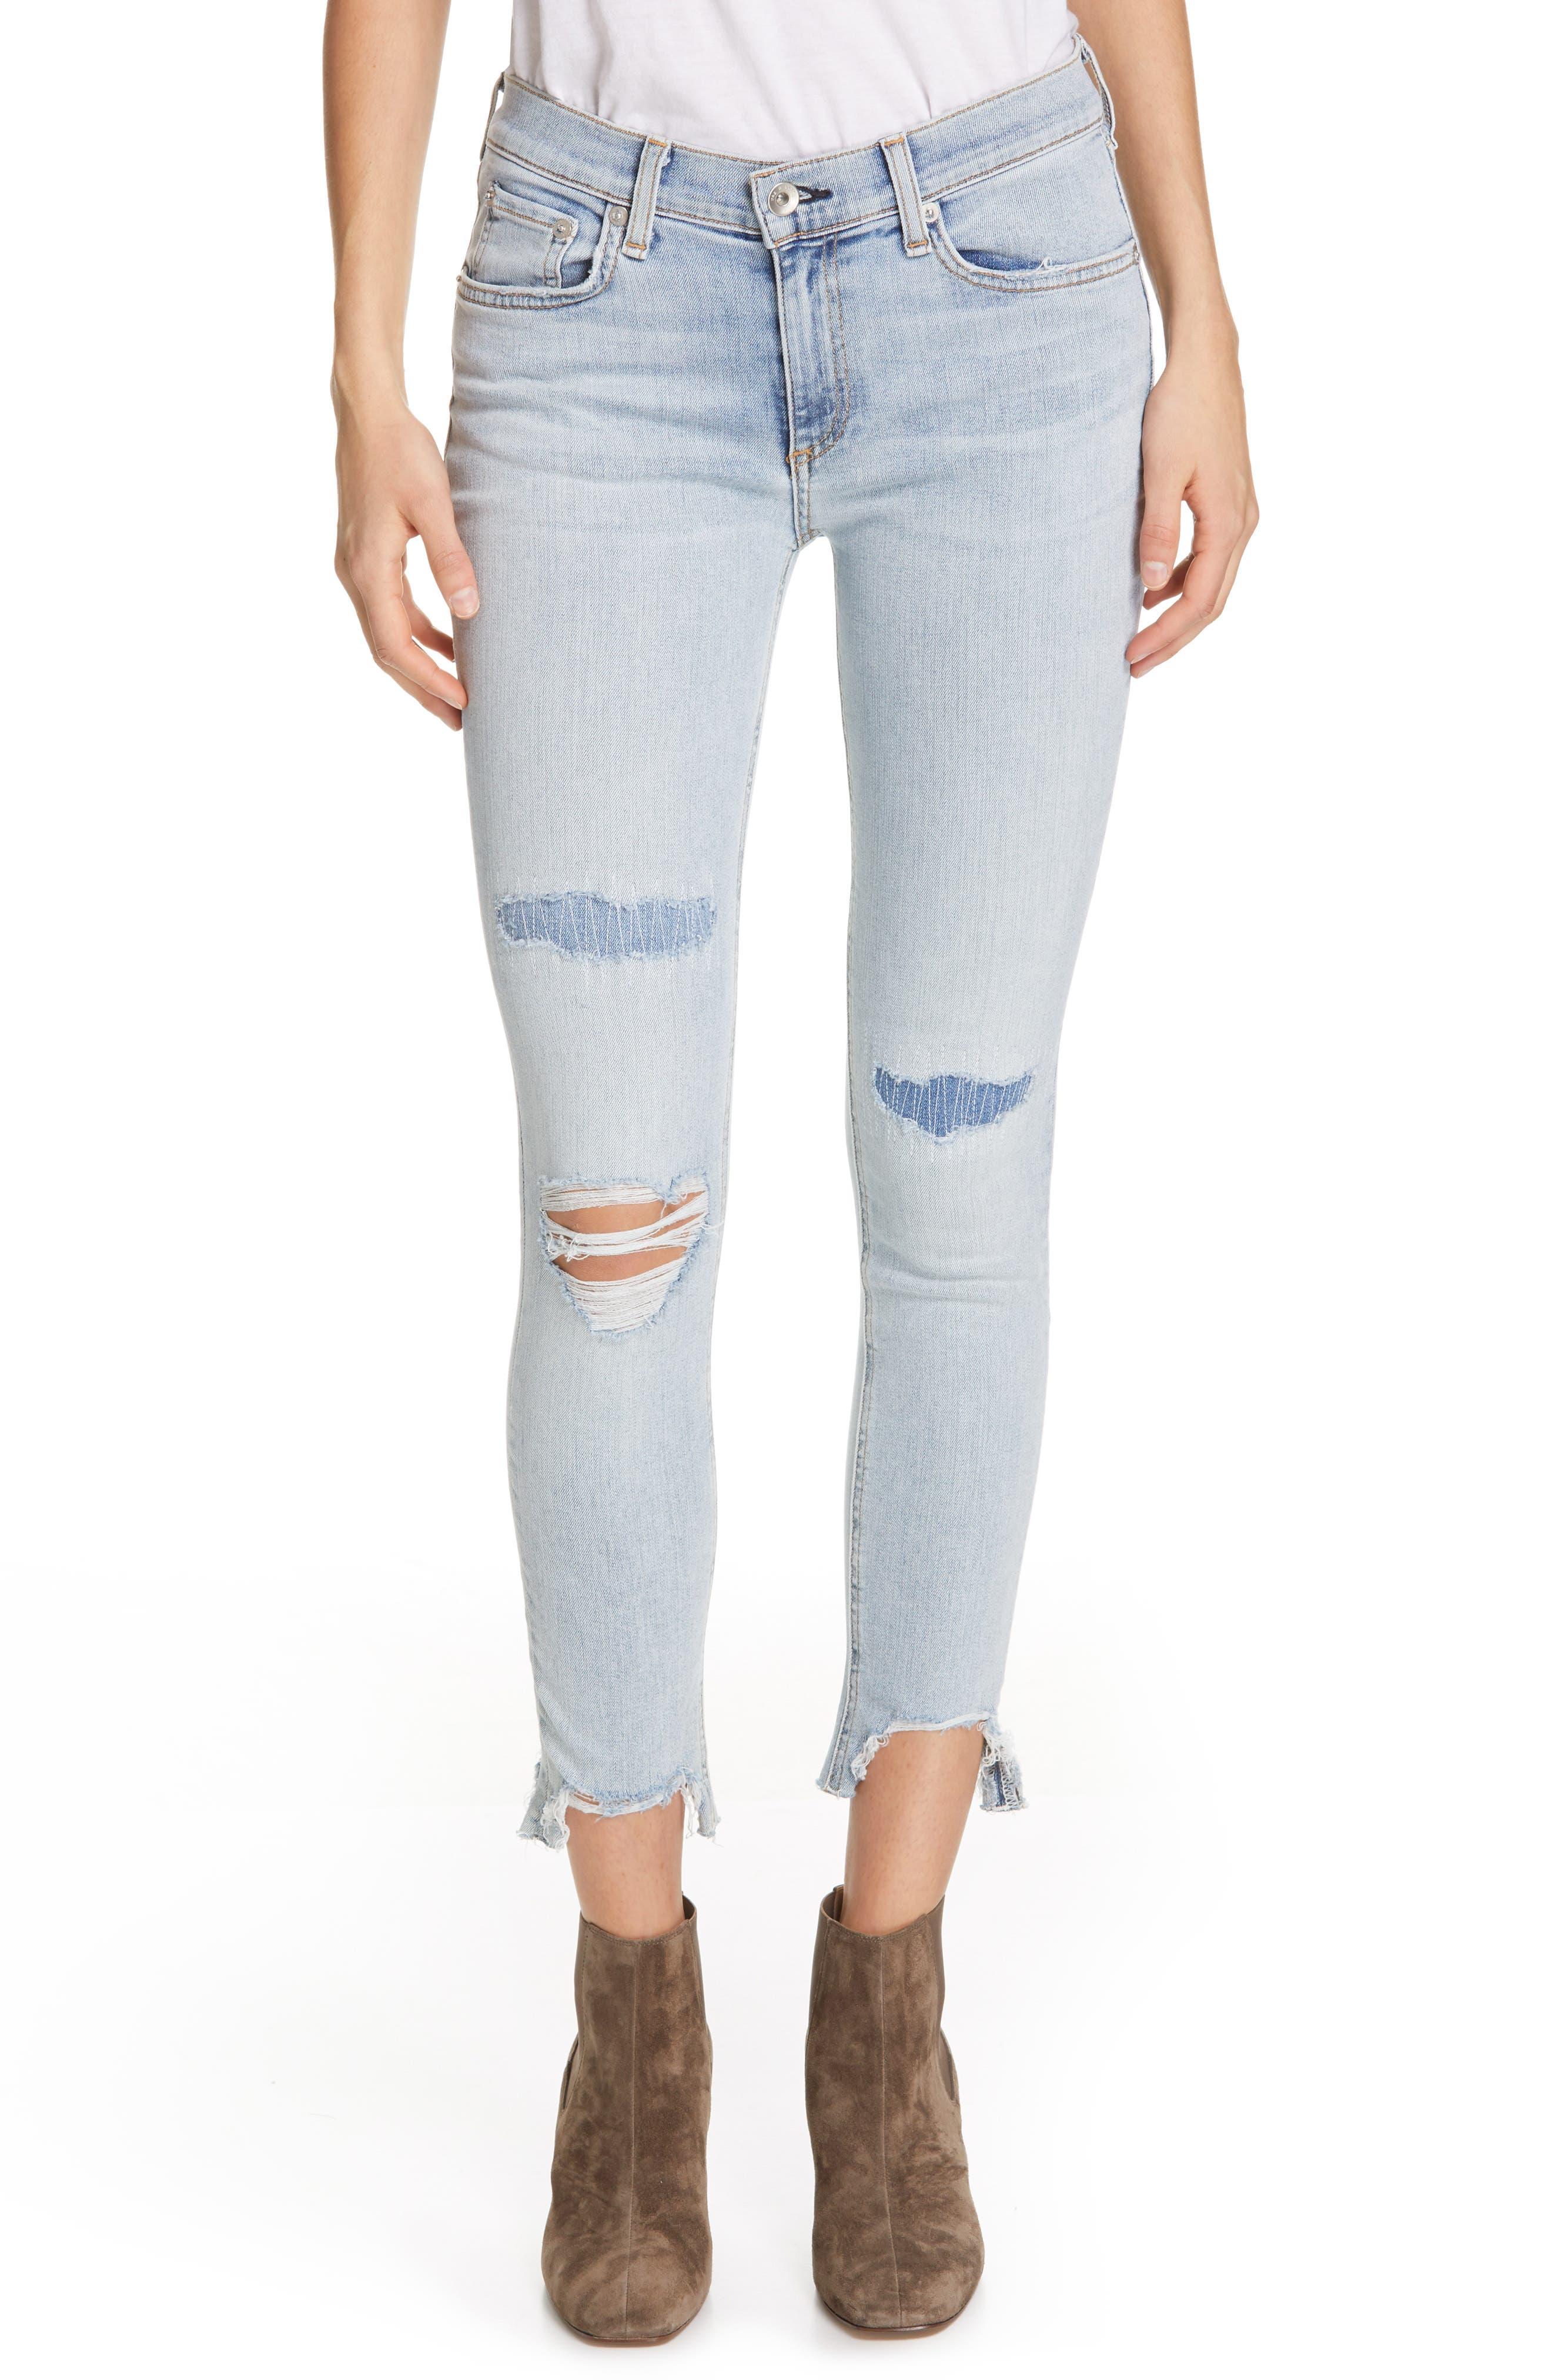 RAG & BONE, JEAN Ripped Ankle Skinny Jeans, Main thumbnail 1, color, 450